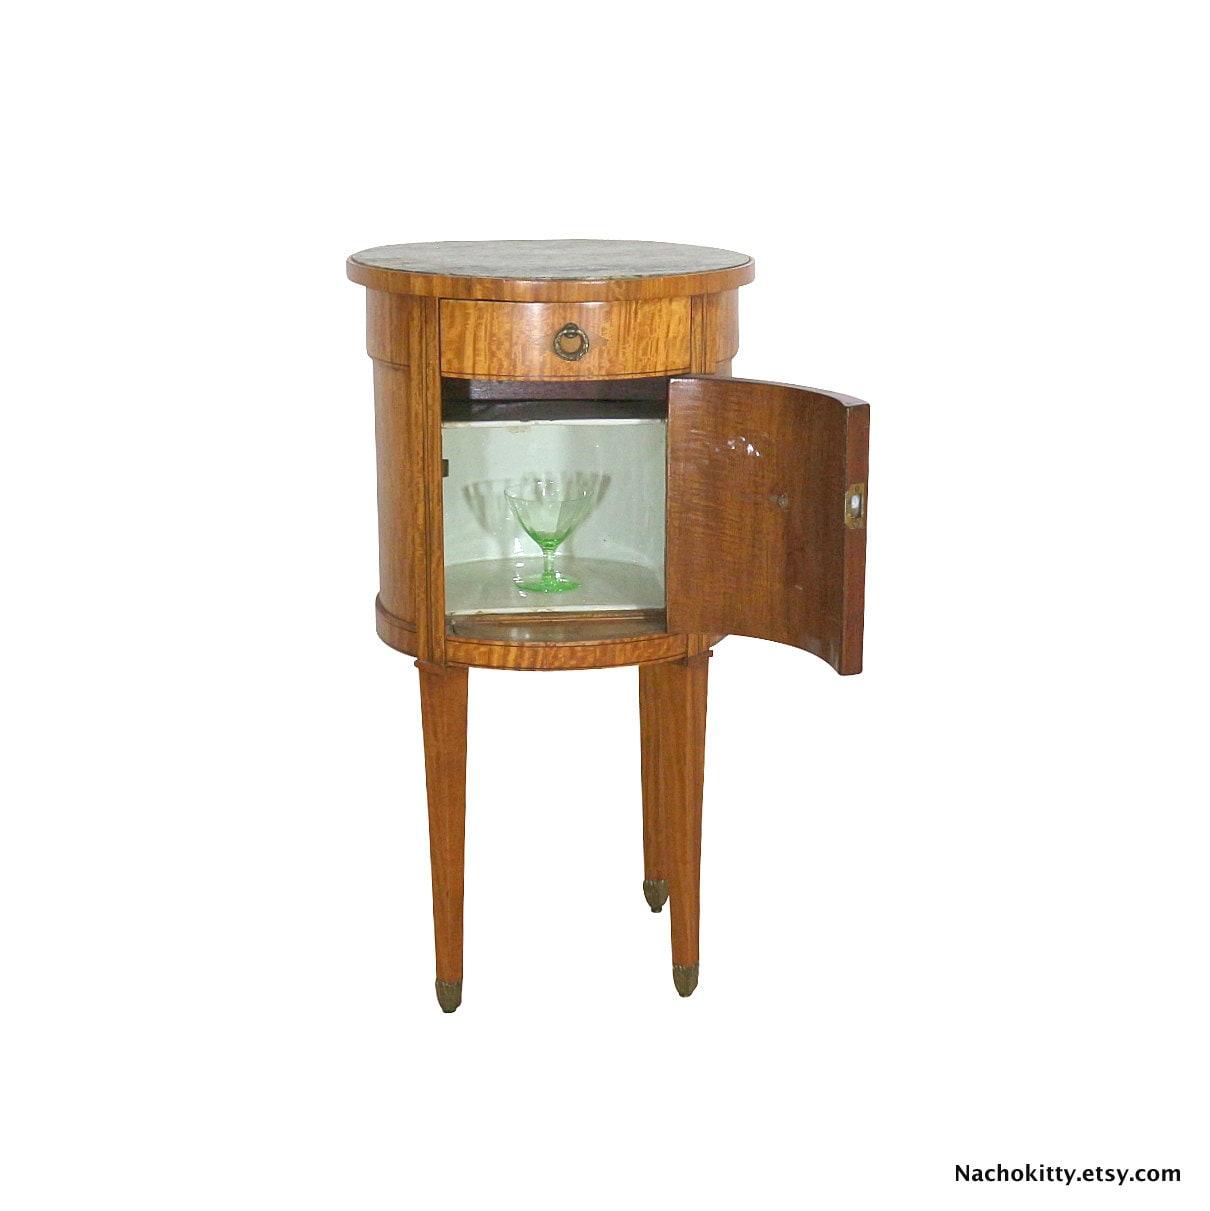 1870s Cigar Humidor Birdseye Maple Side Table By Nachokitty